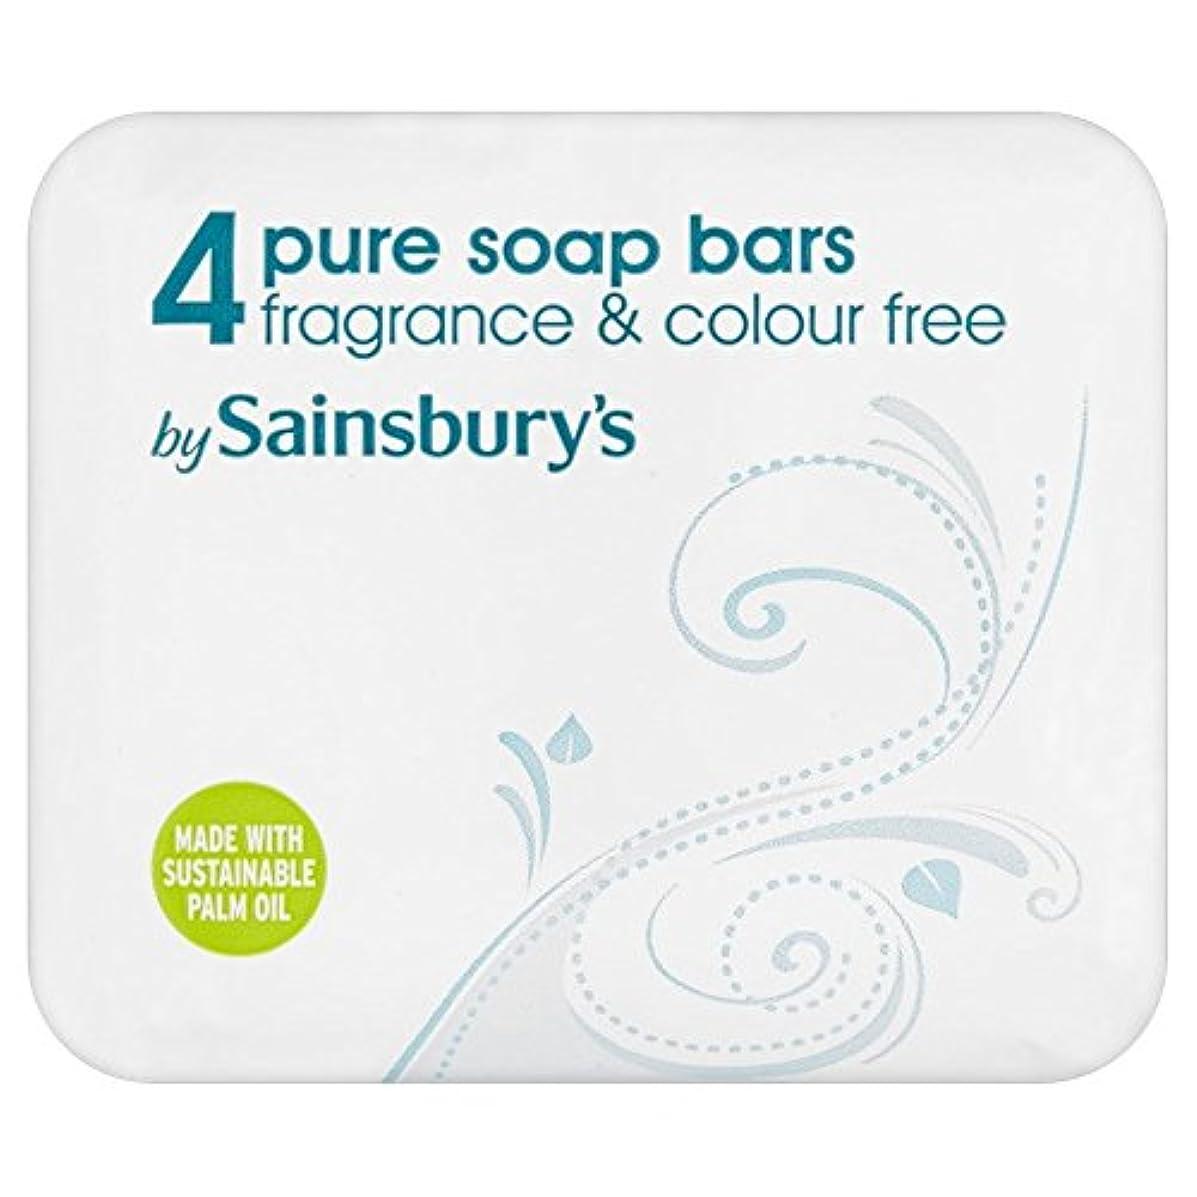 Sainsbury's Pure Soap 4x125g (Pack of 2) - (Sainsbury's) 純粋な石鹸4X125G (x2) [並行輸入品]